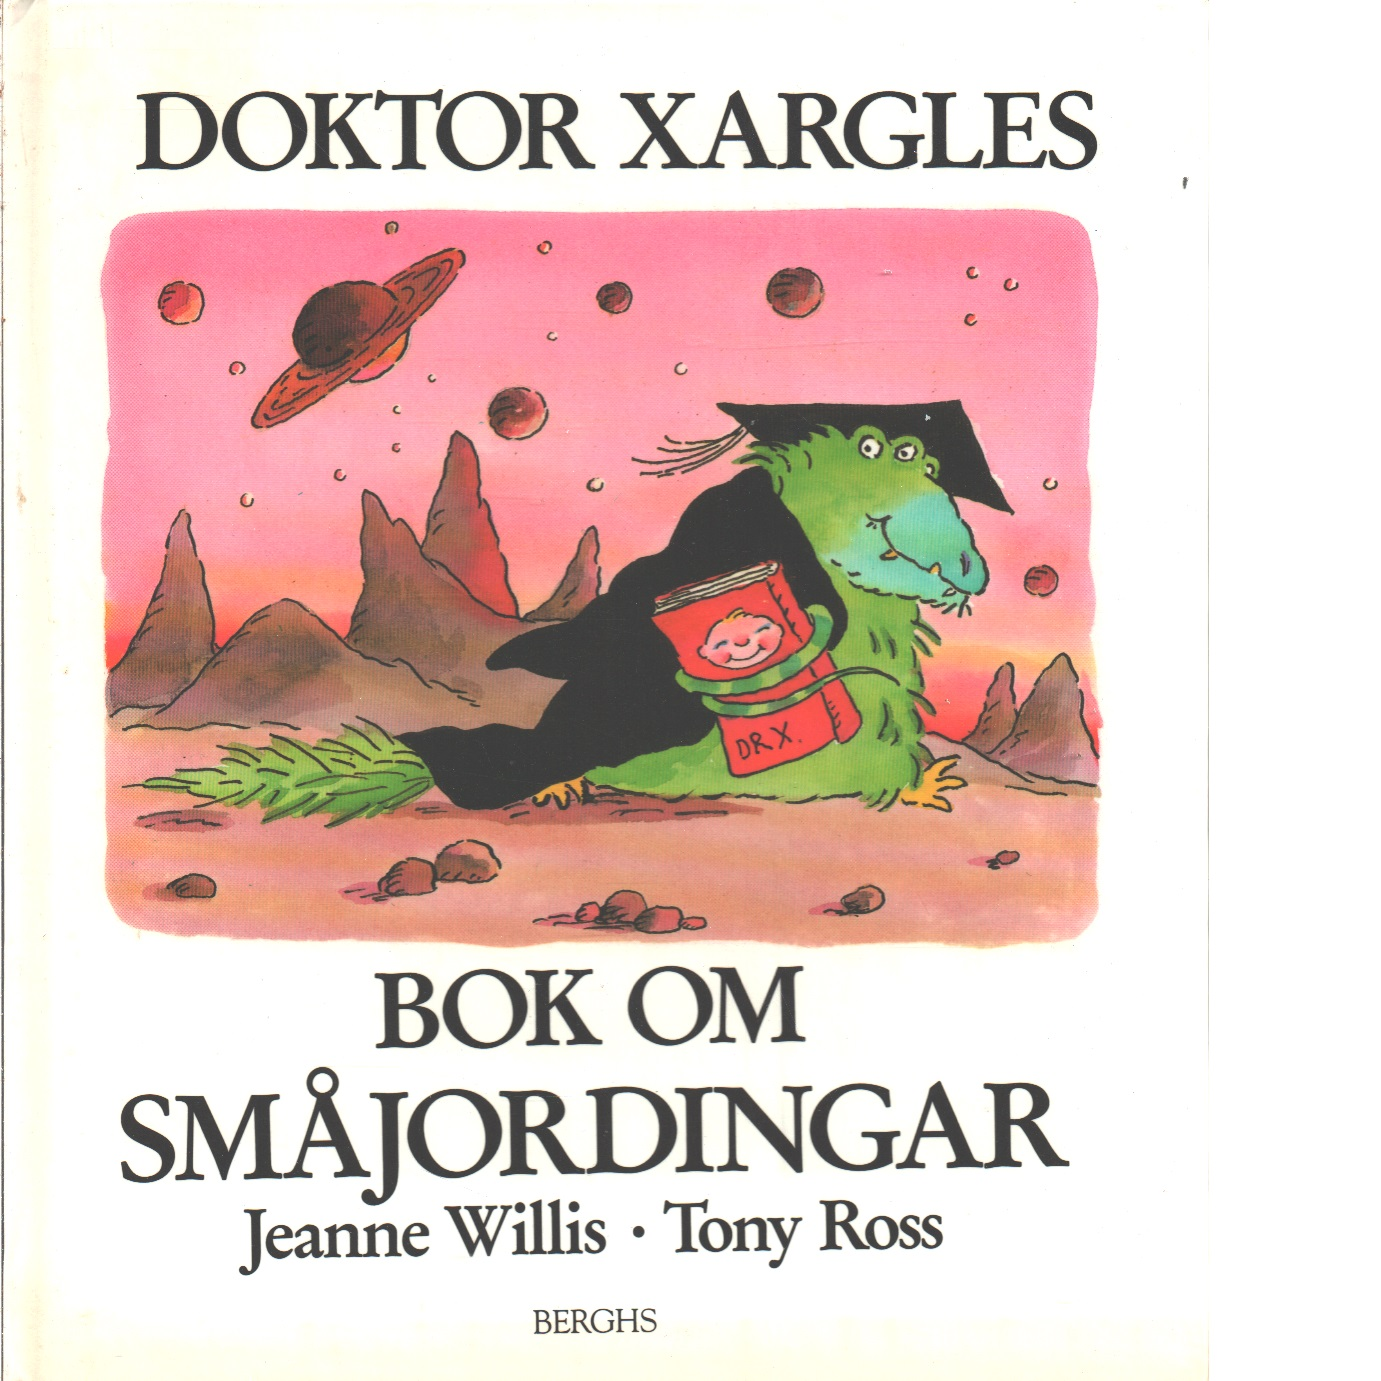 Doktor Xargles bok om småjordingar  - Willis, Jeanne och Doktor Xargles bok om småjordingar